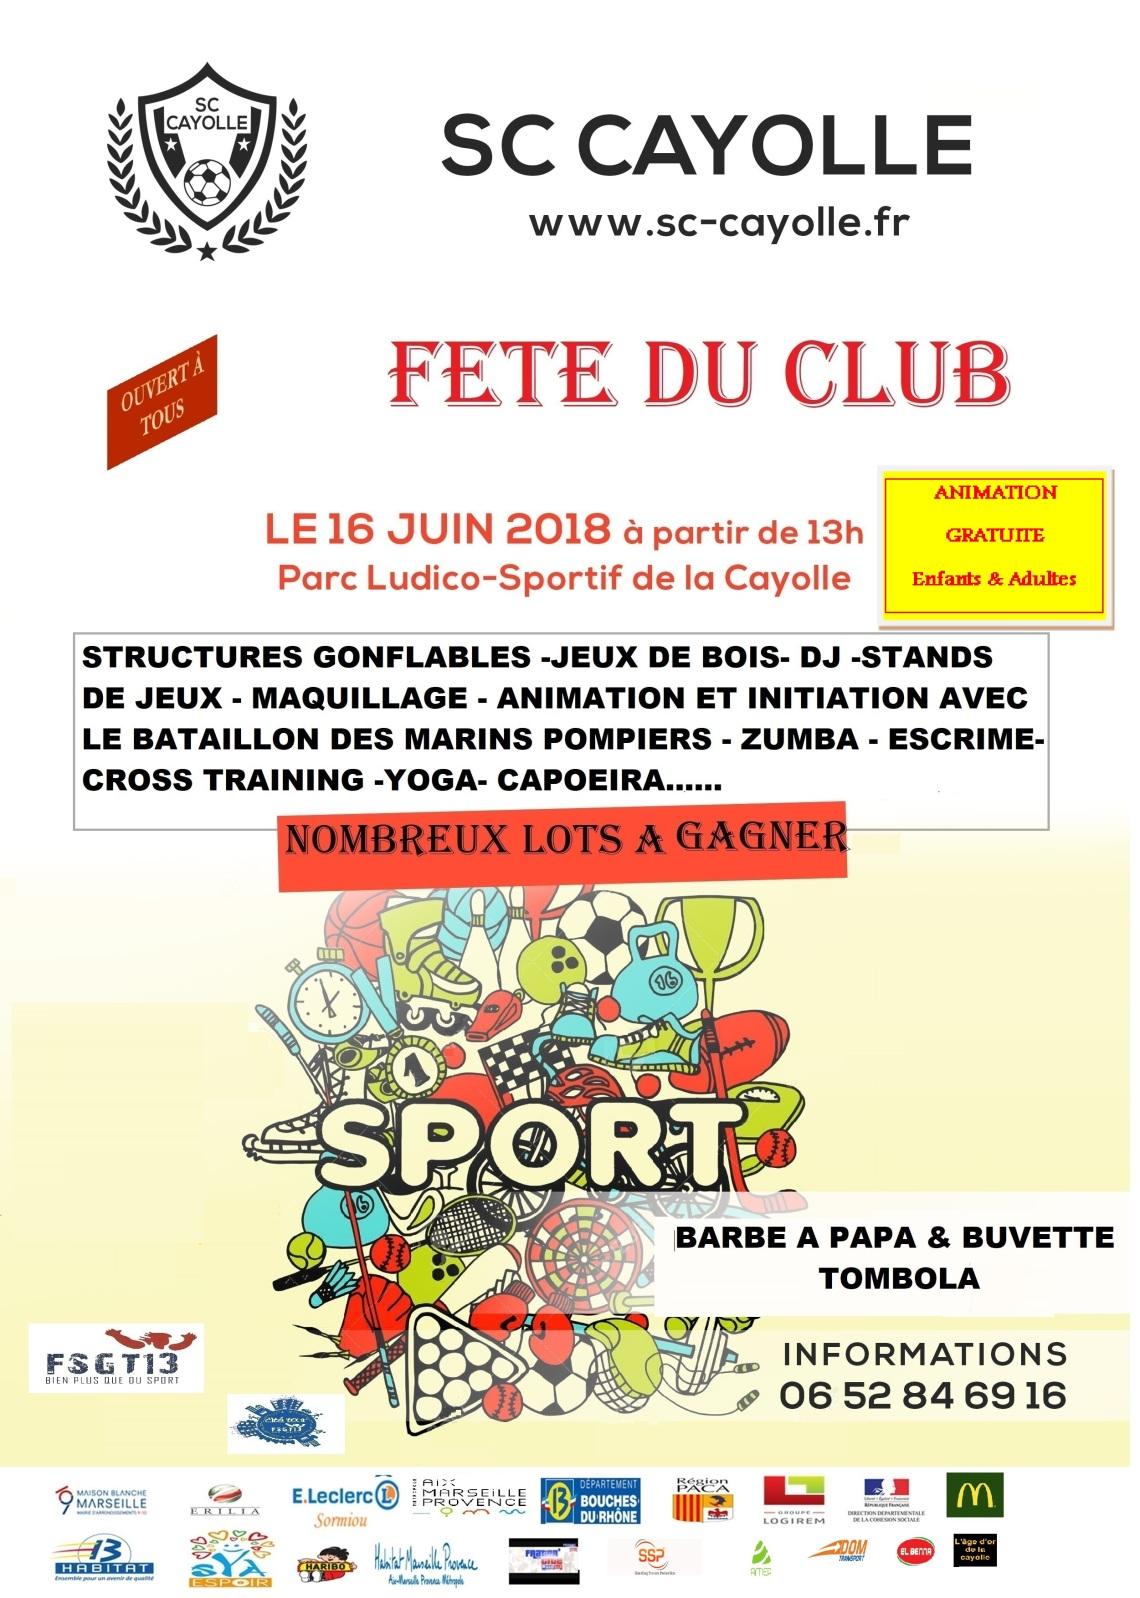 affiche-sc-cayolle-kermesse-derniere 2018(1) (1)